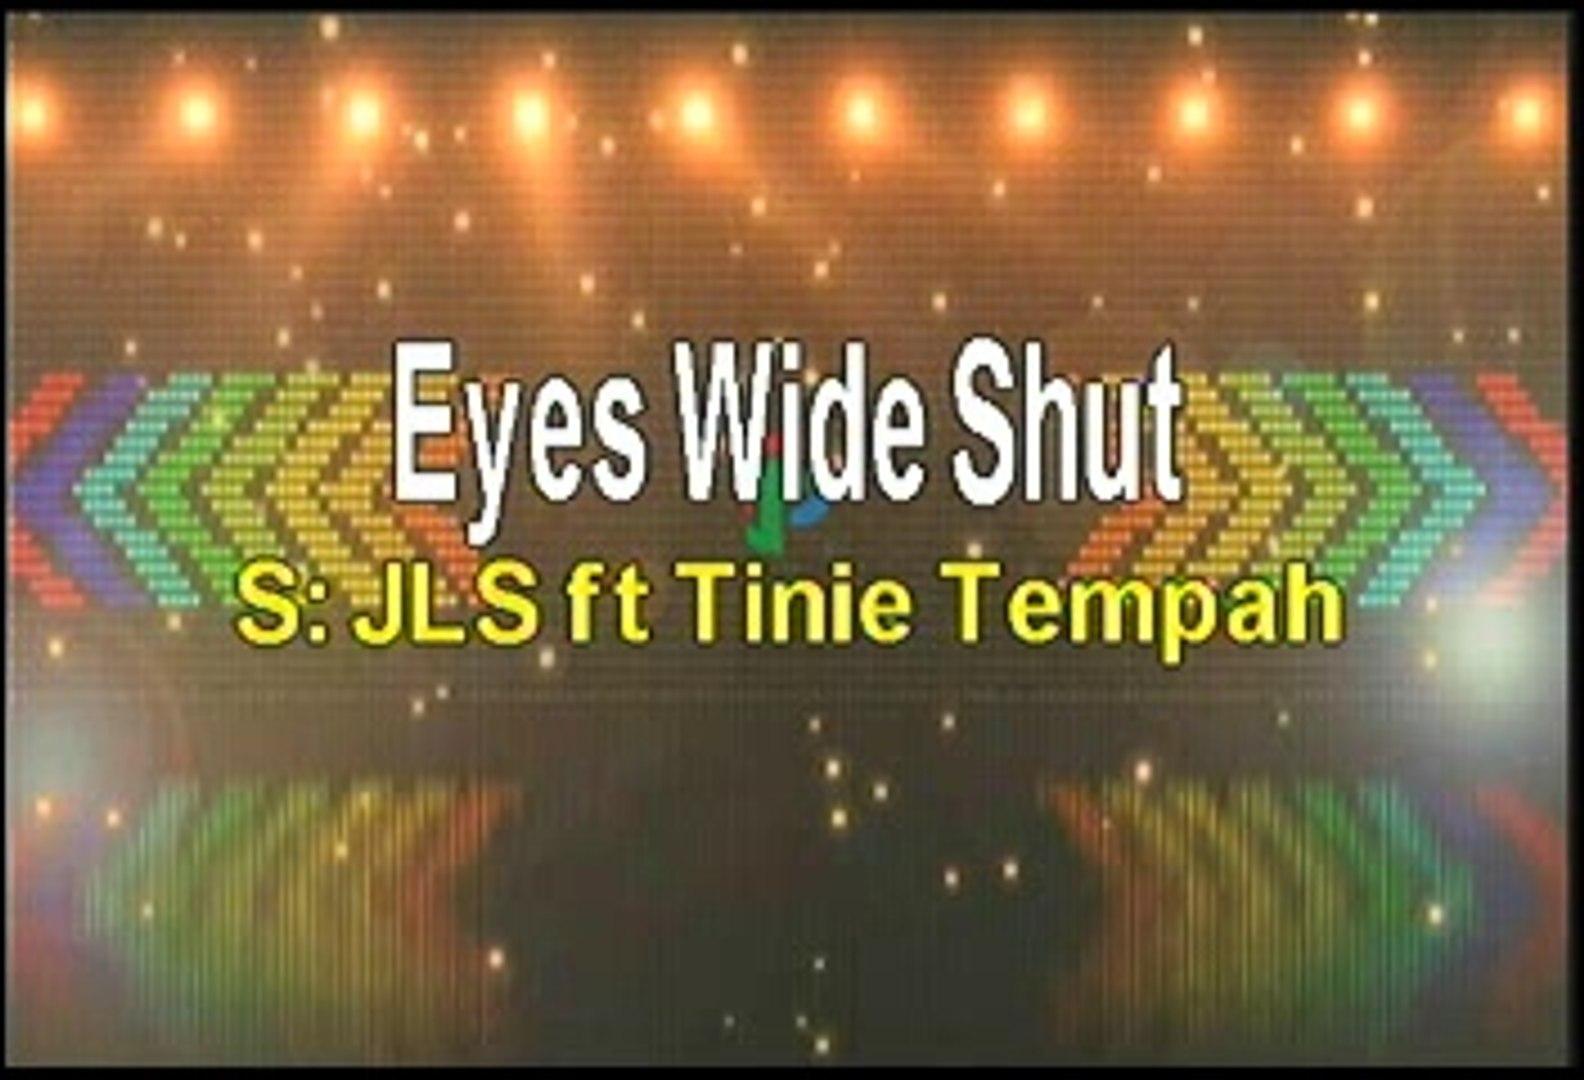 JLS ft Tinie Timpah Eyes Wide Shut Karaoke Version - video